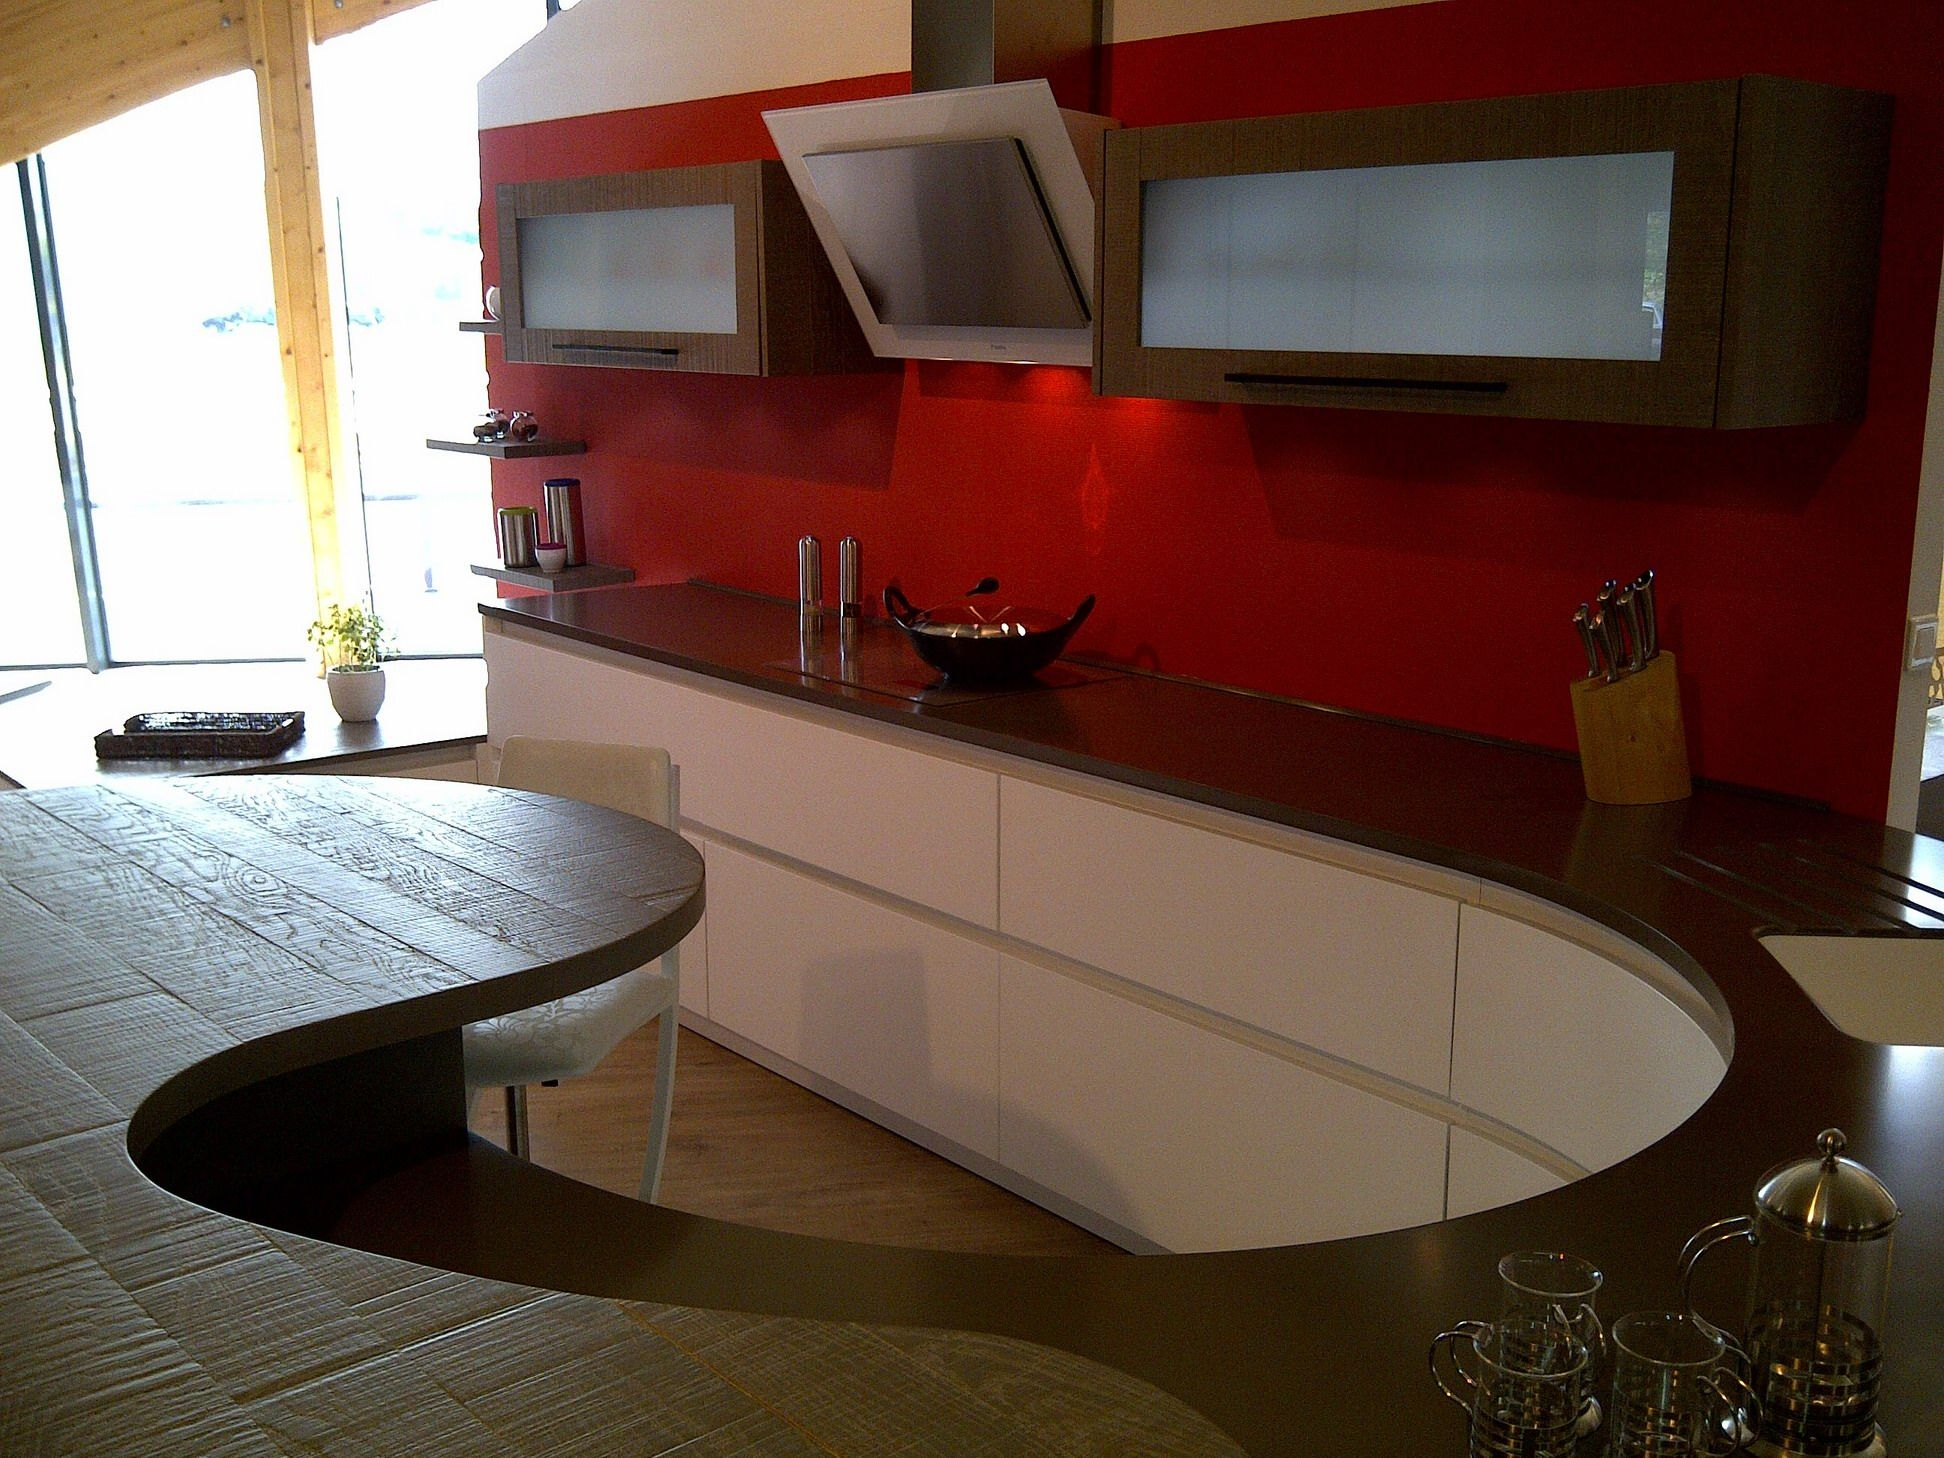 Campana extractora de pared pando p 731 cocinas con for Guardas decorativas para cocina